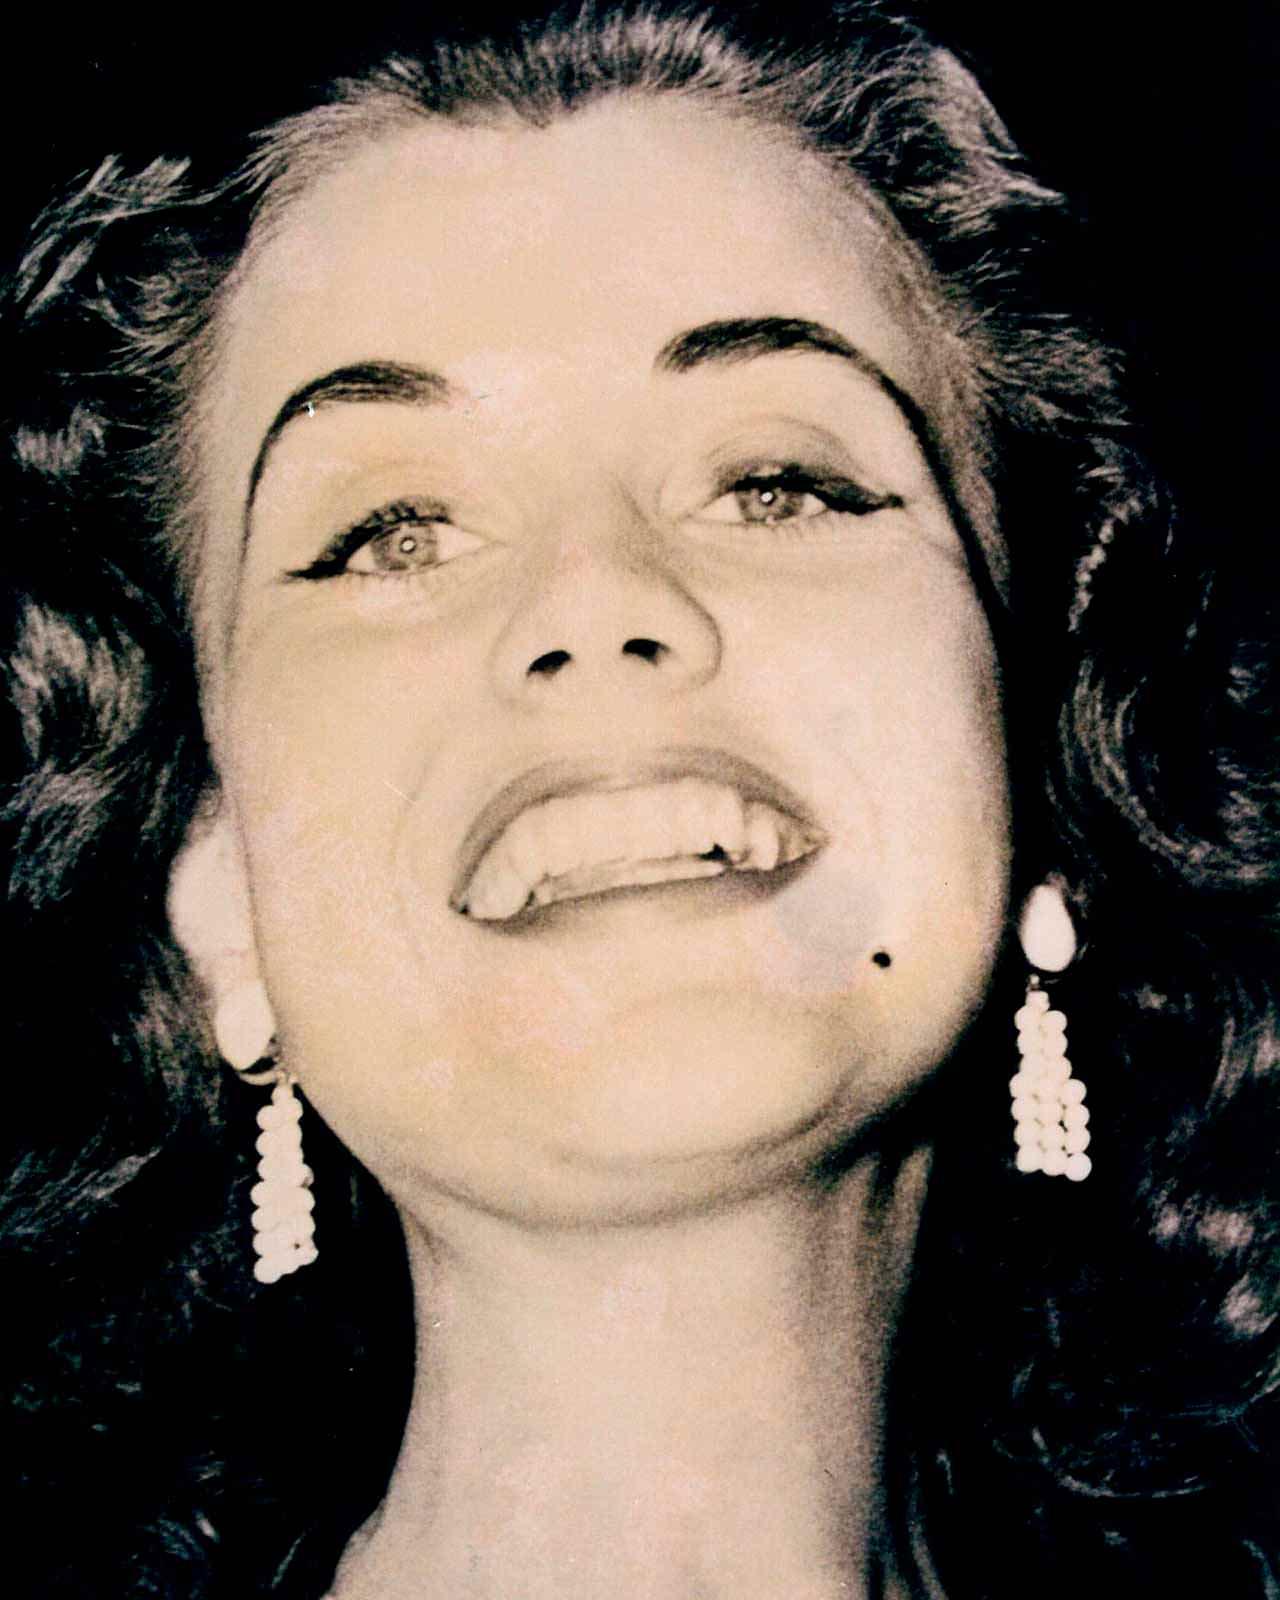 Фото   Мисс Мира 1951 года Кикки Хоканссон